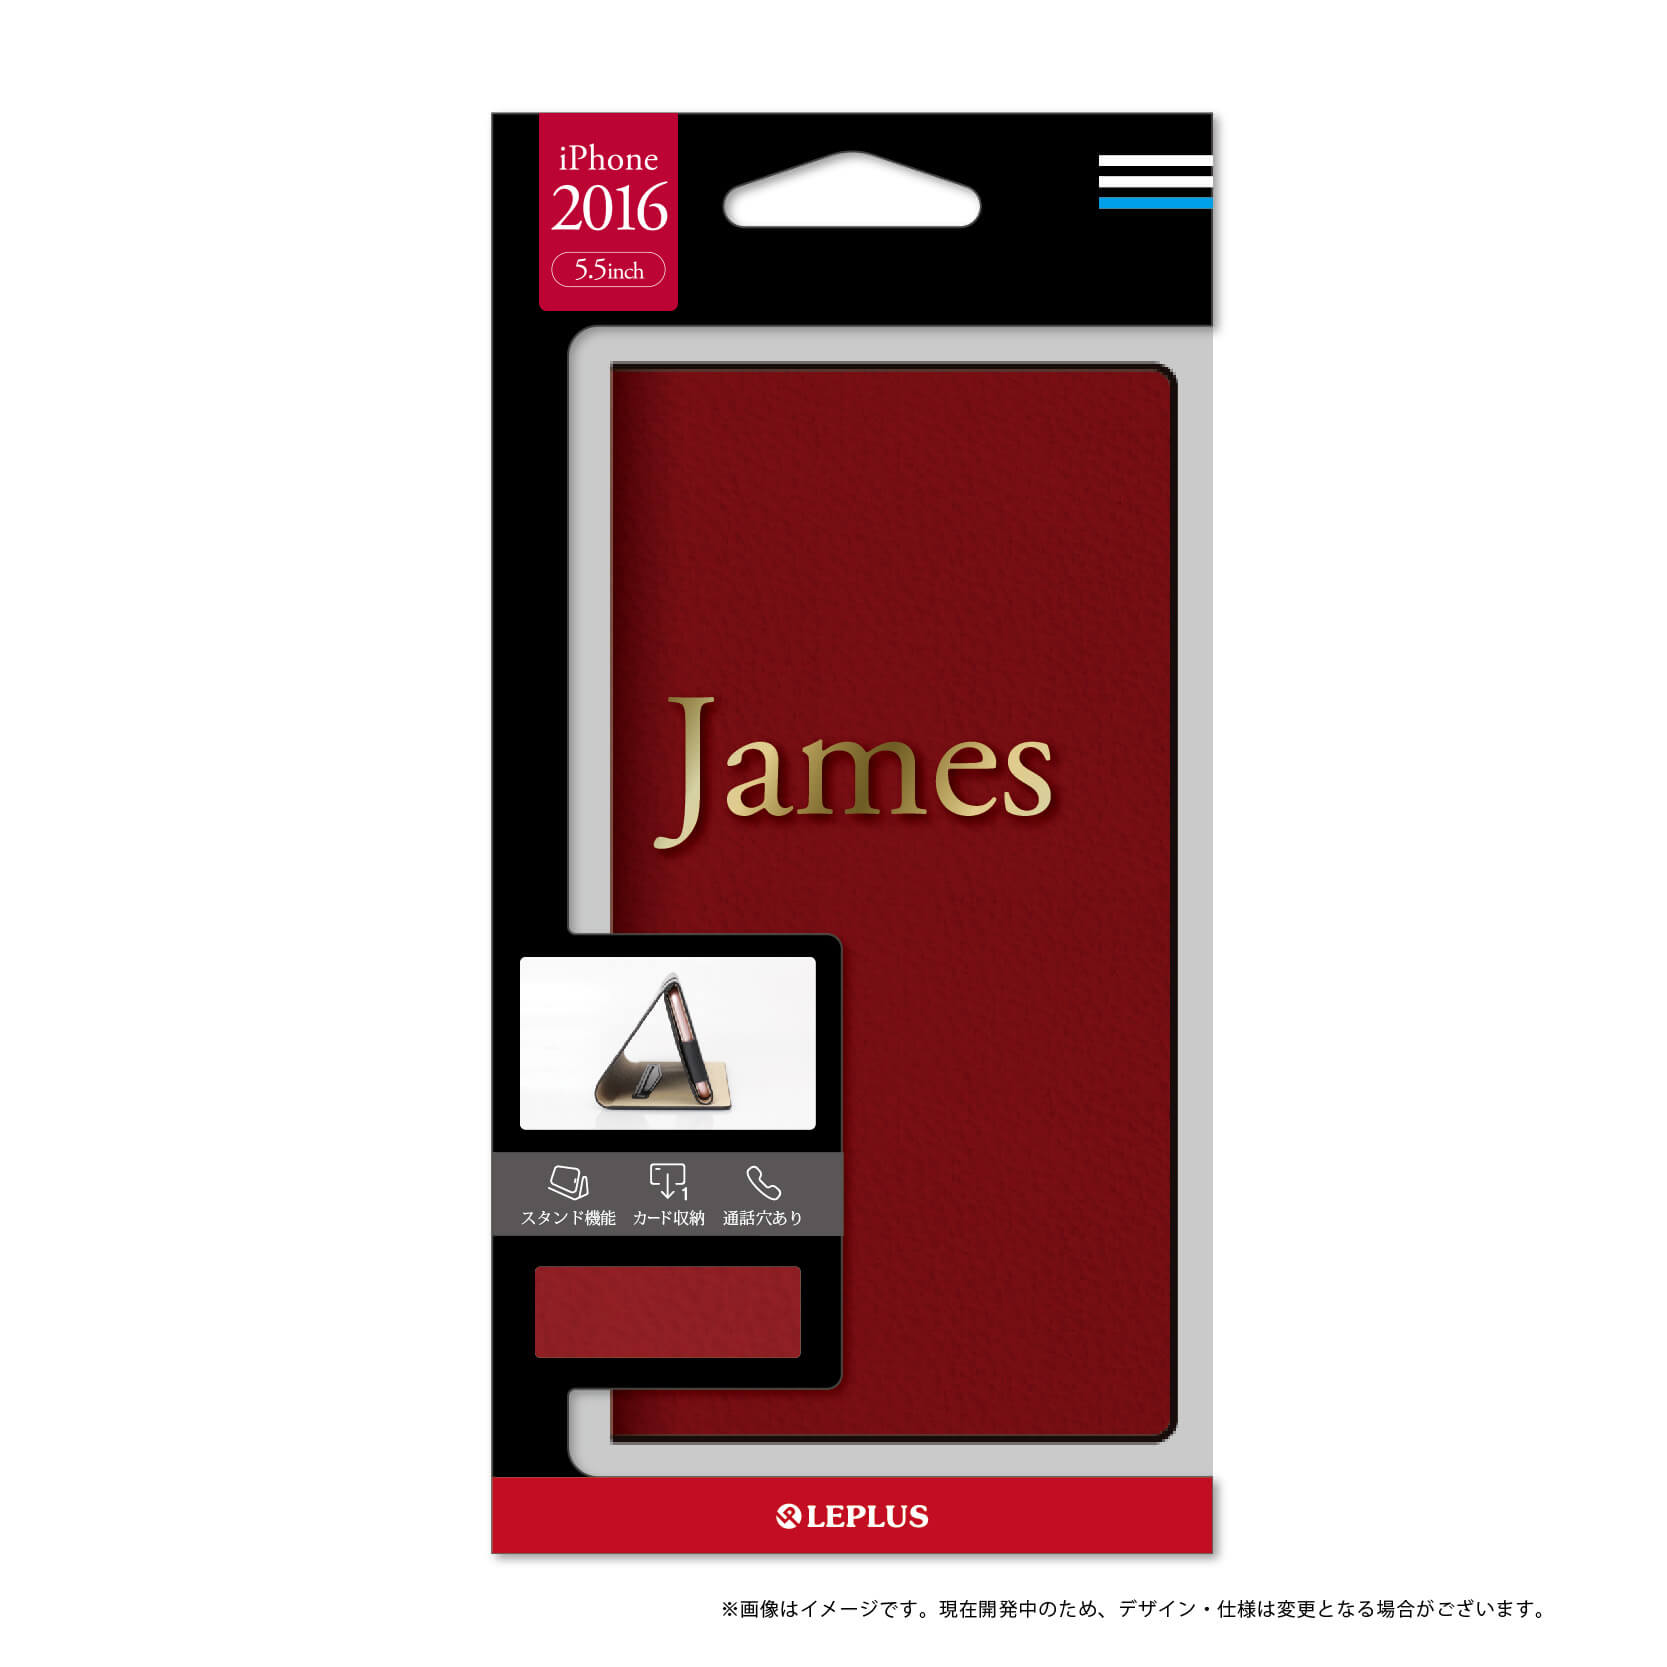 iPhone7 Plus 一枚革PUレザーケース「James」 レッド